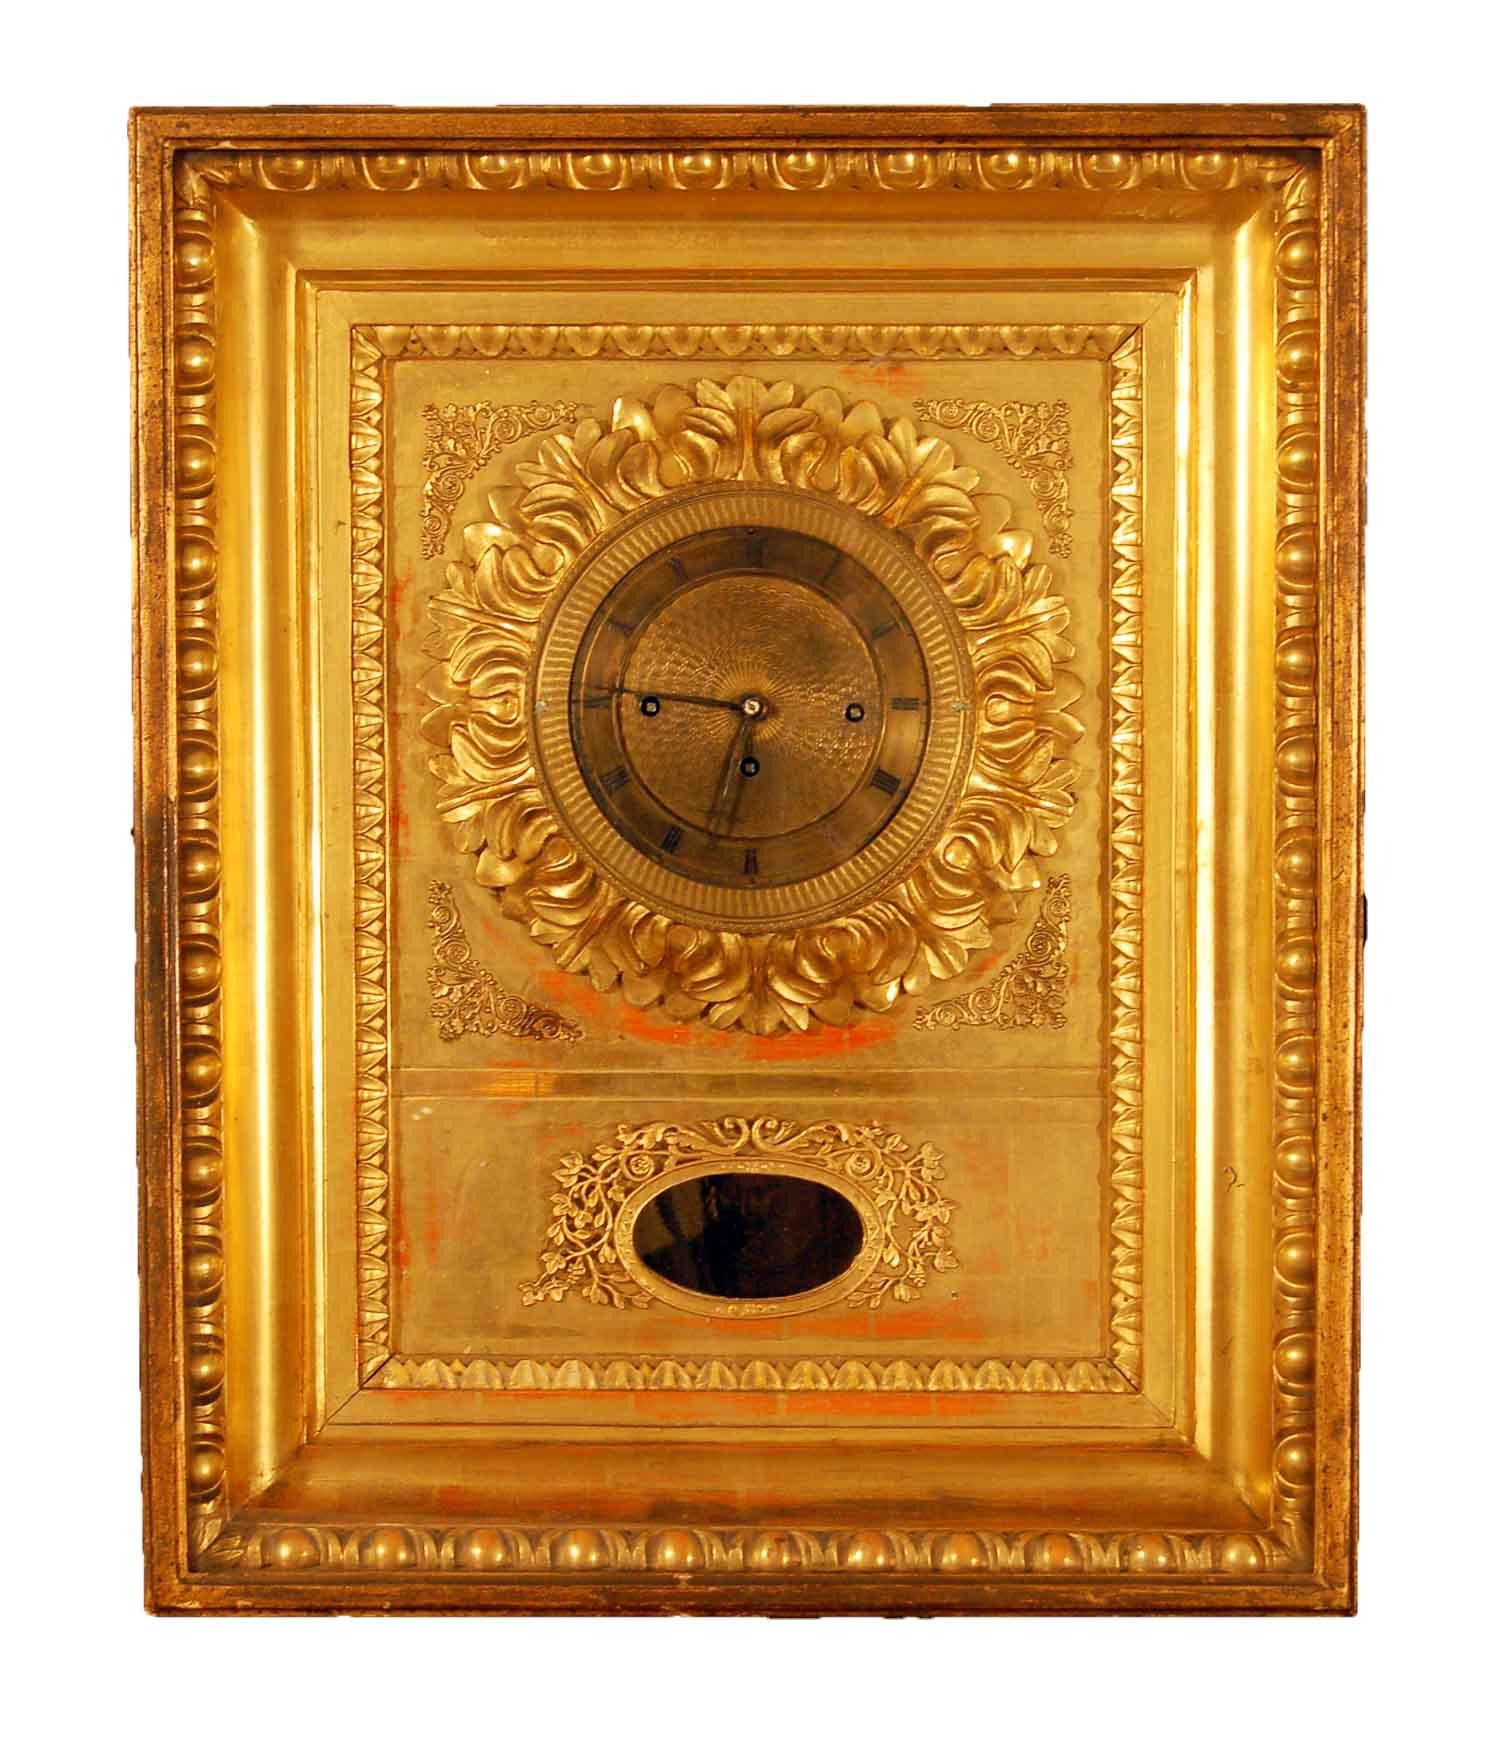 Biedermeier-Rahmenuhr, 19.Jh; 4/4-Schlag, orig.-Vergoldung, intakt, ca. 42x52x17cm(B/H/T)